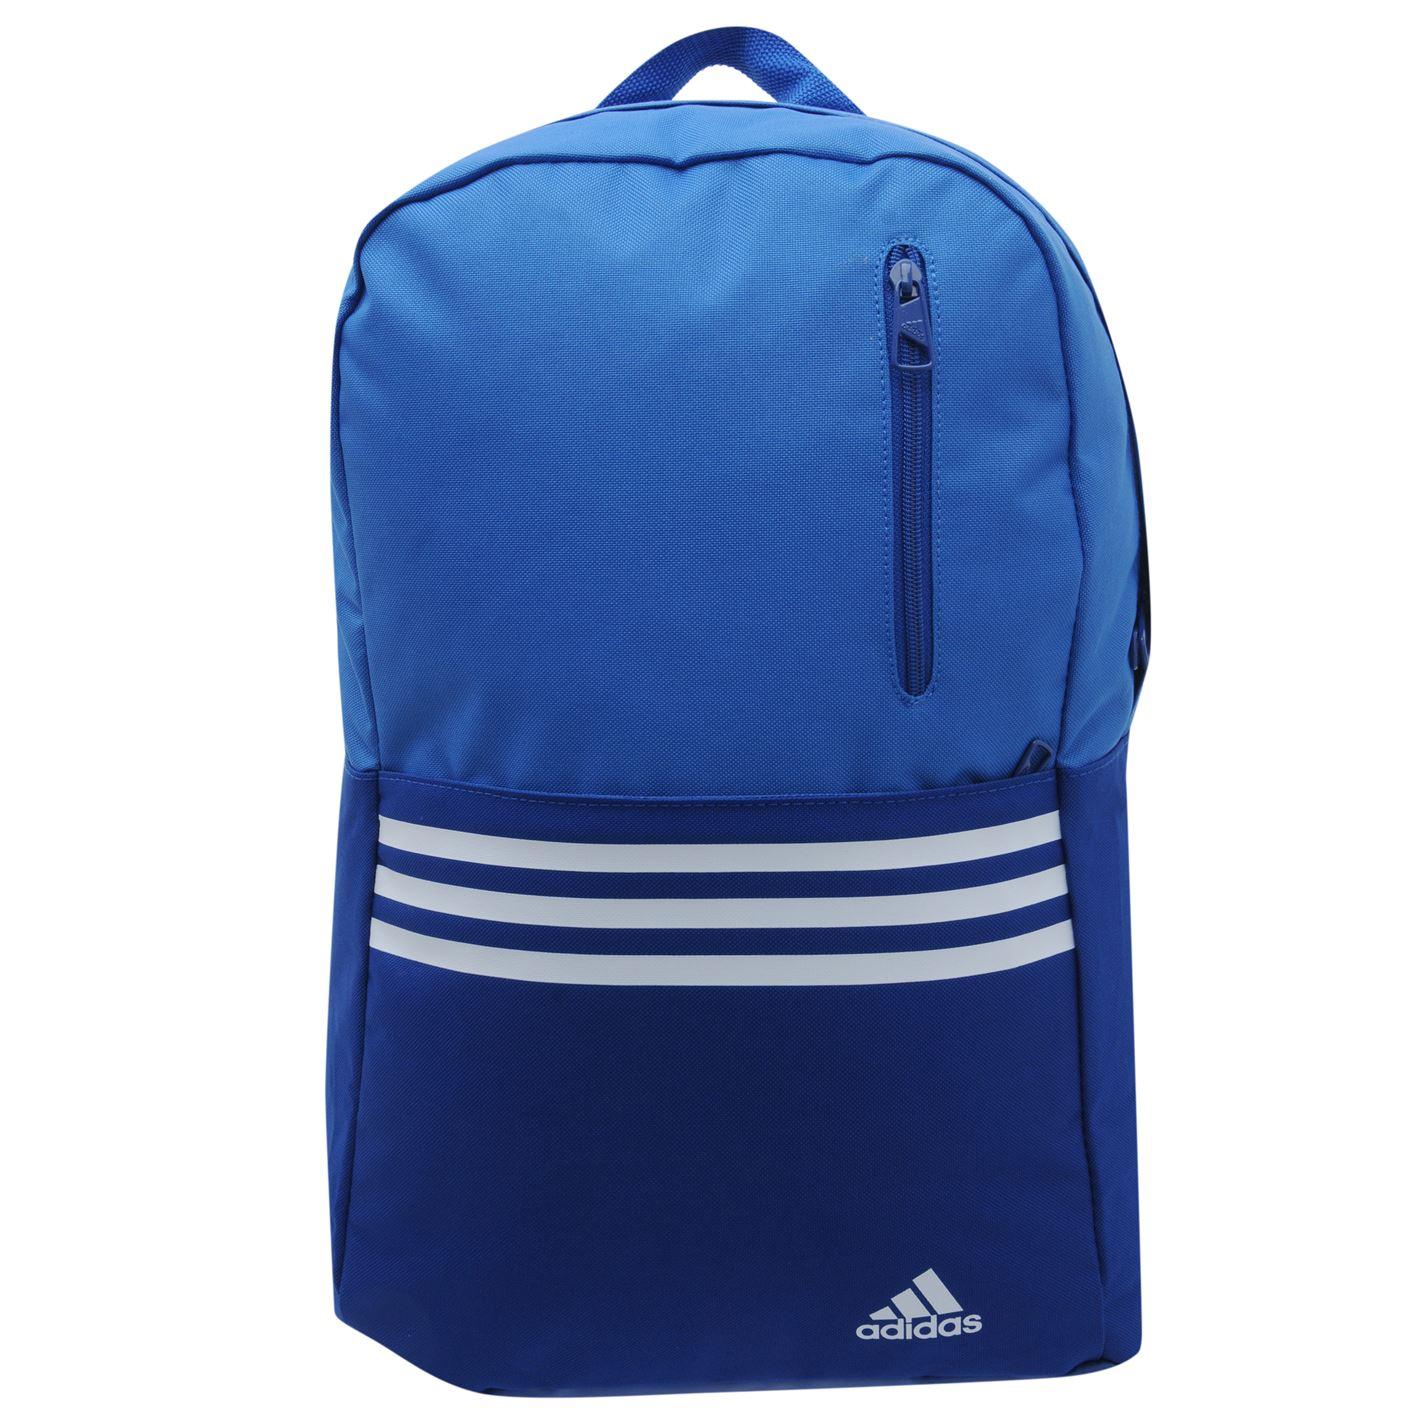 b50693faad6c adidas 3s Vers Backpack Rucksack School Casual Travel Luggage ...